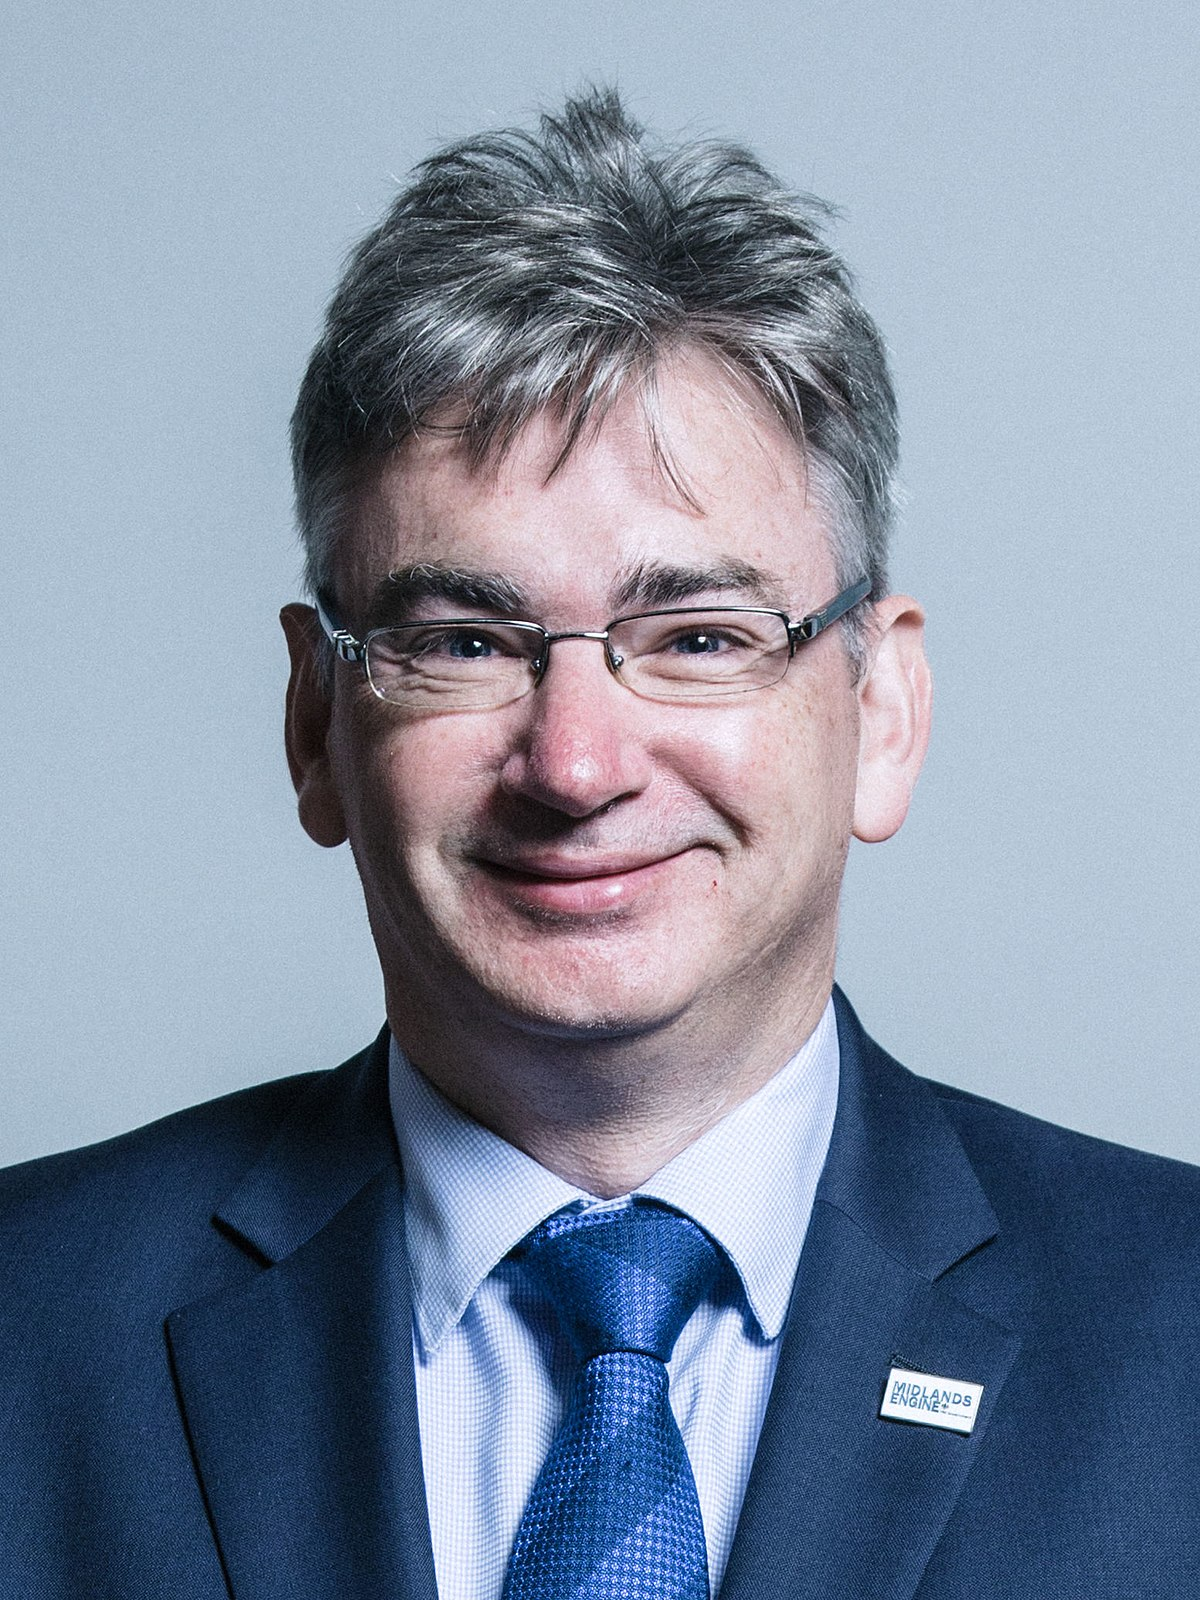 julian knight politician wikipedia